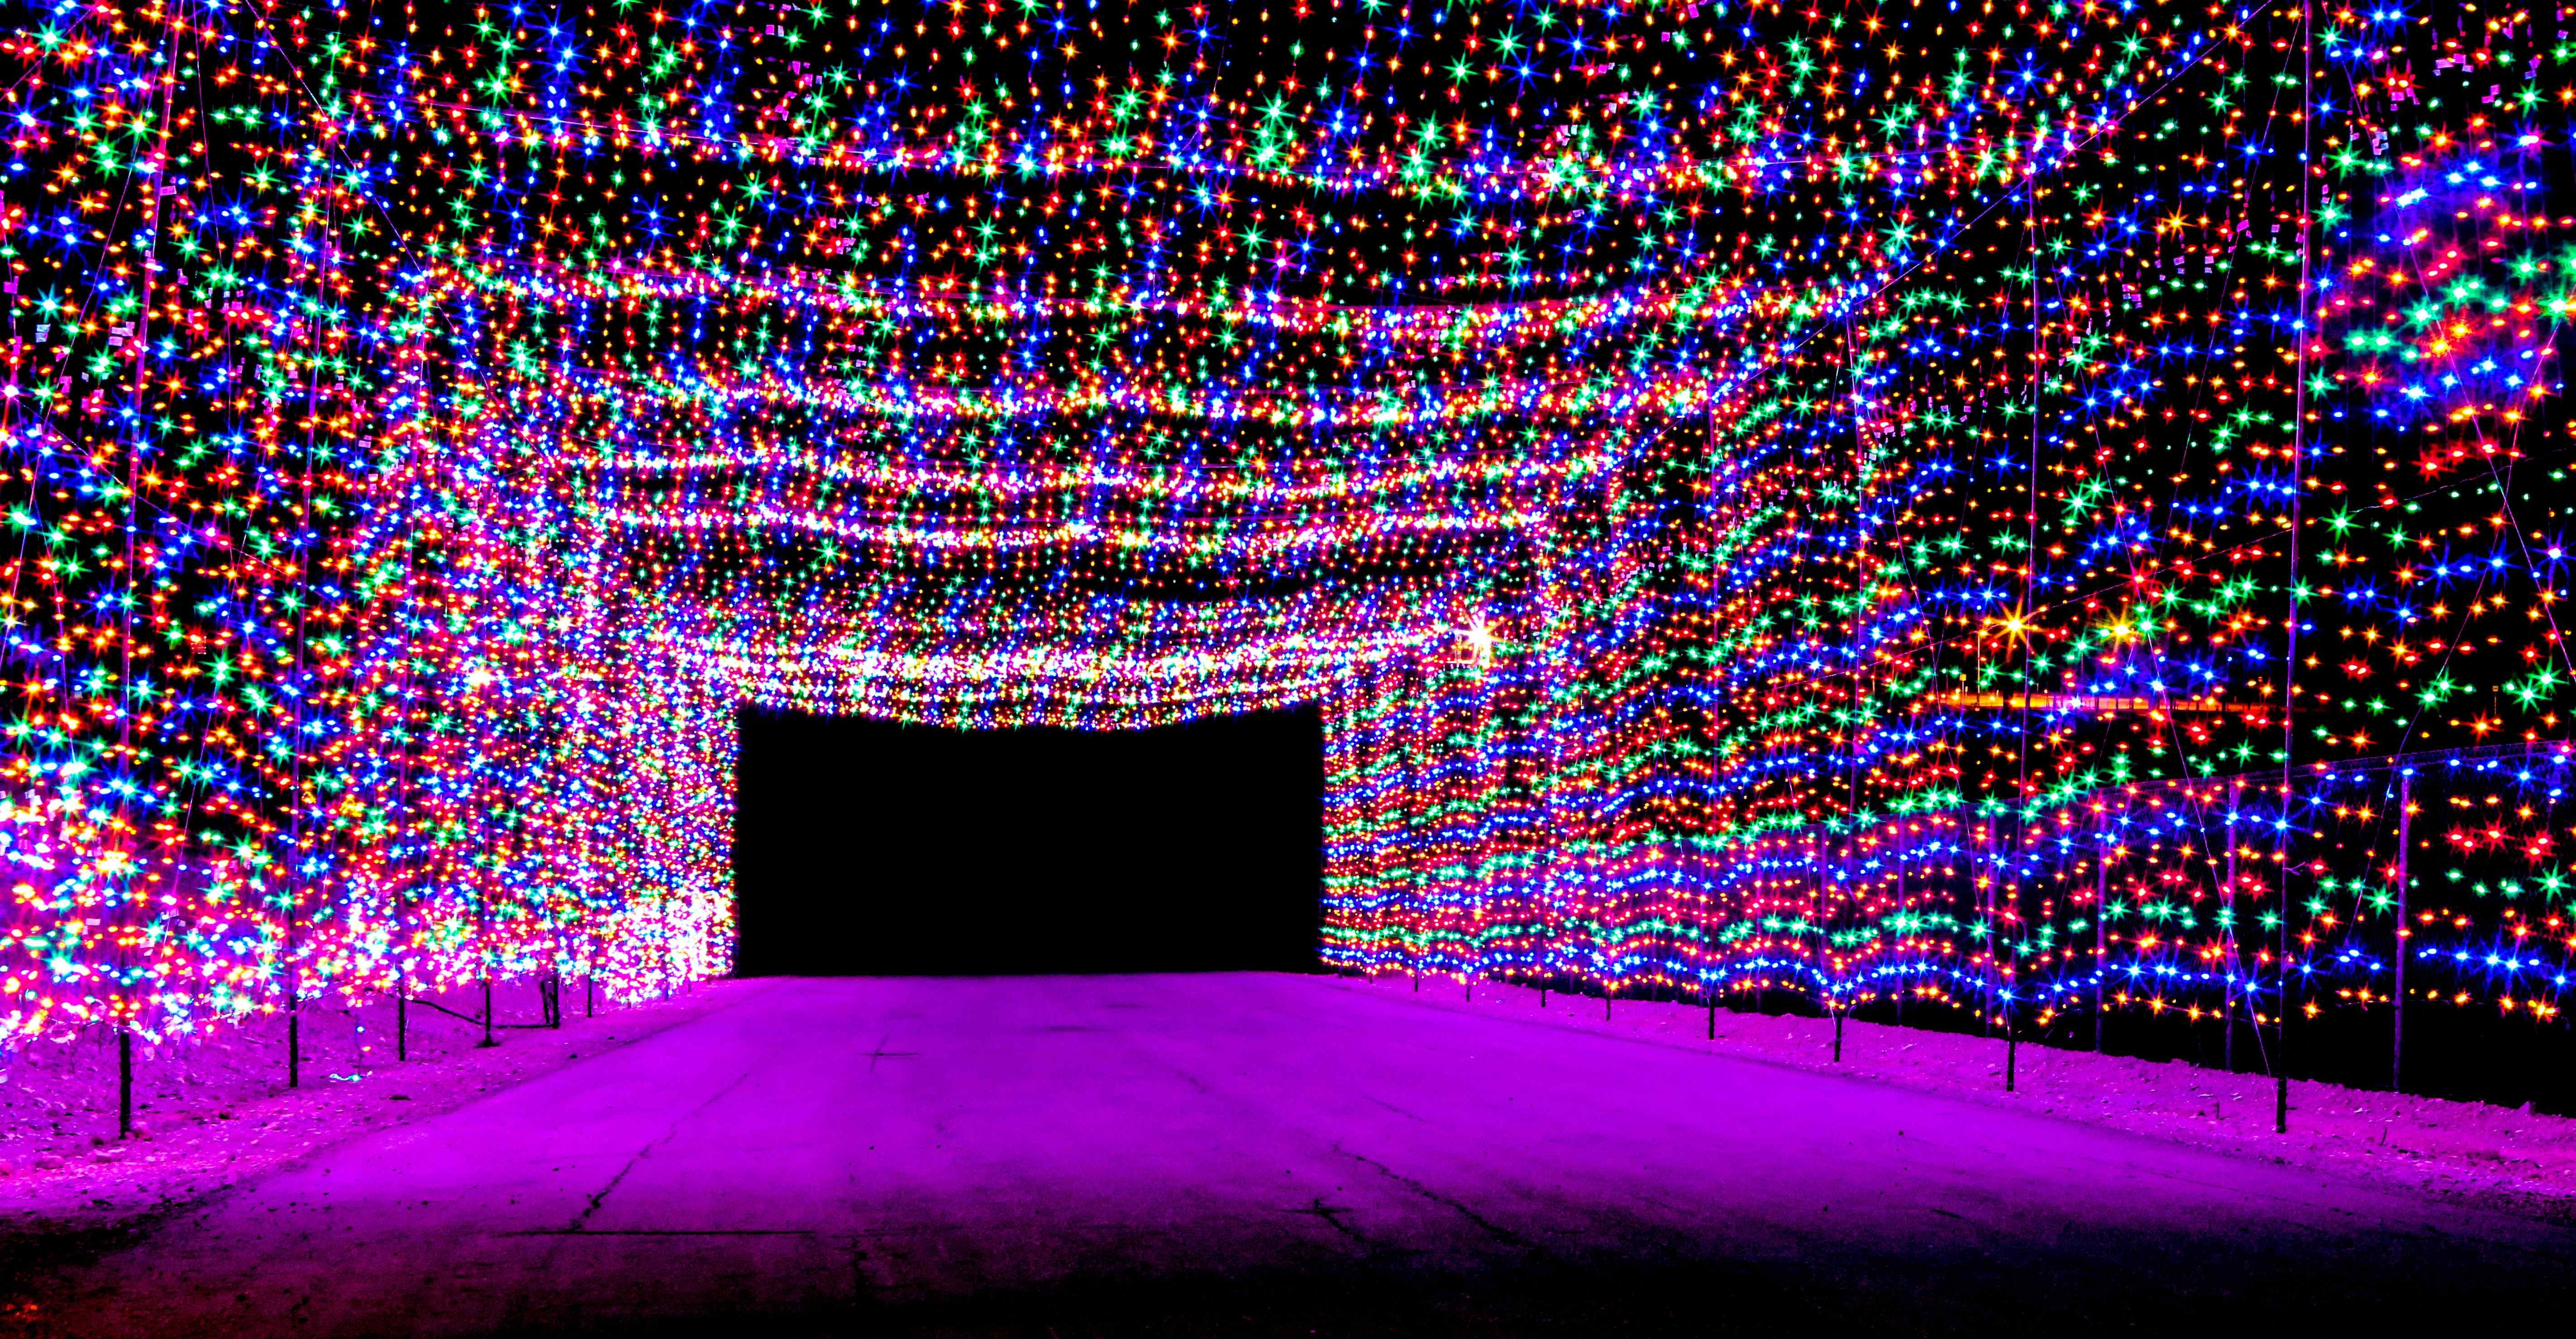 Anderson Motor Speedway Christmas Lights Noconexpress